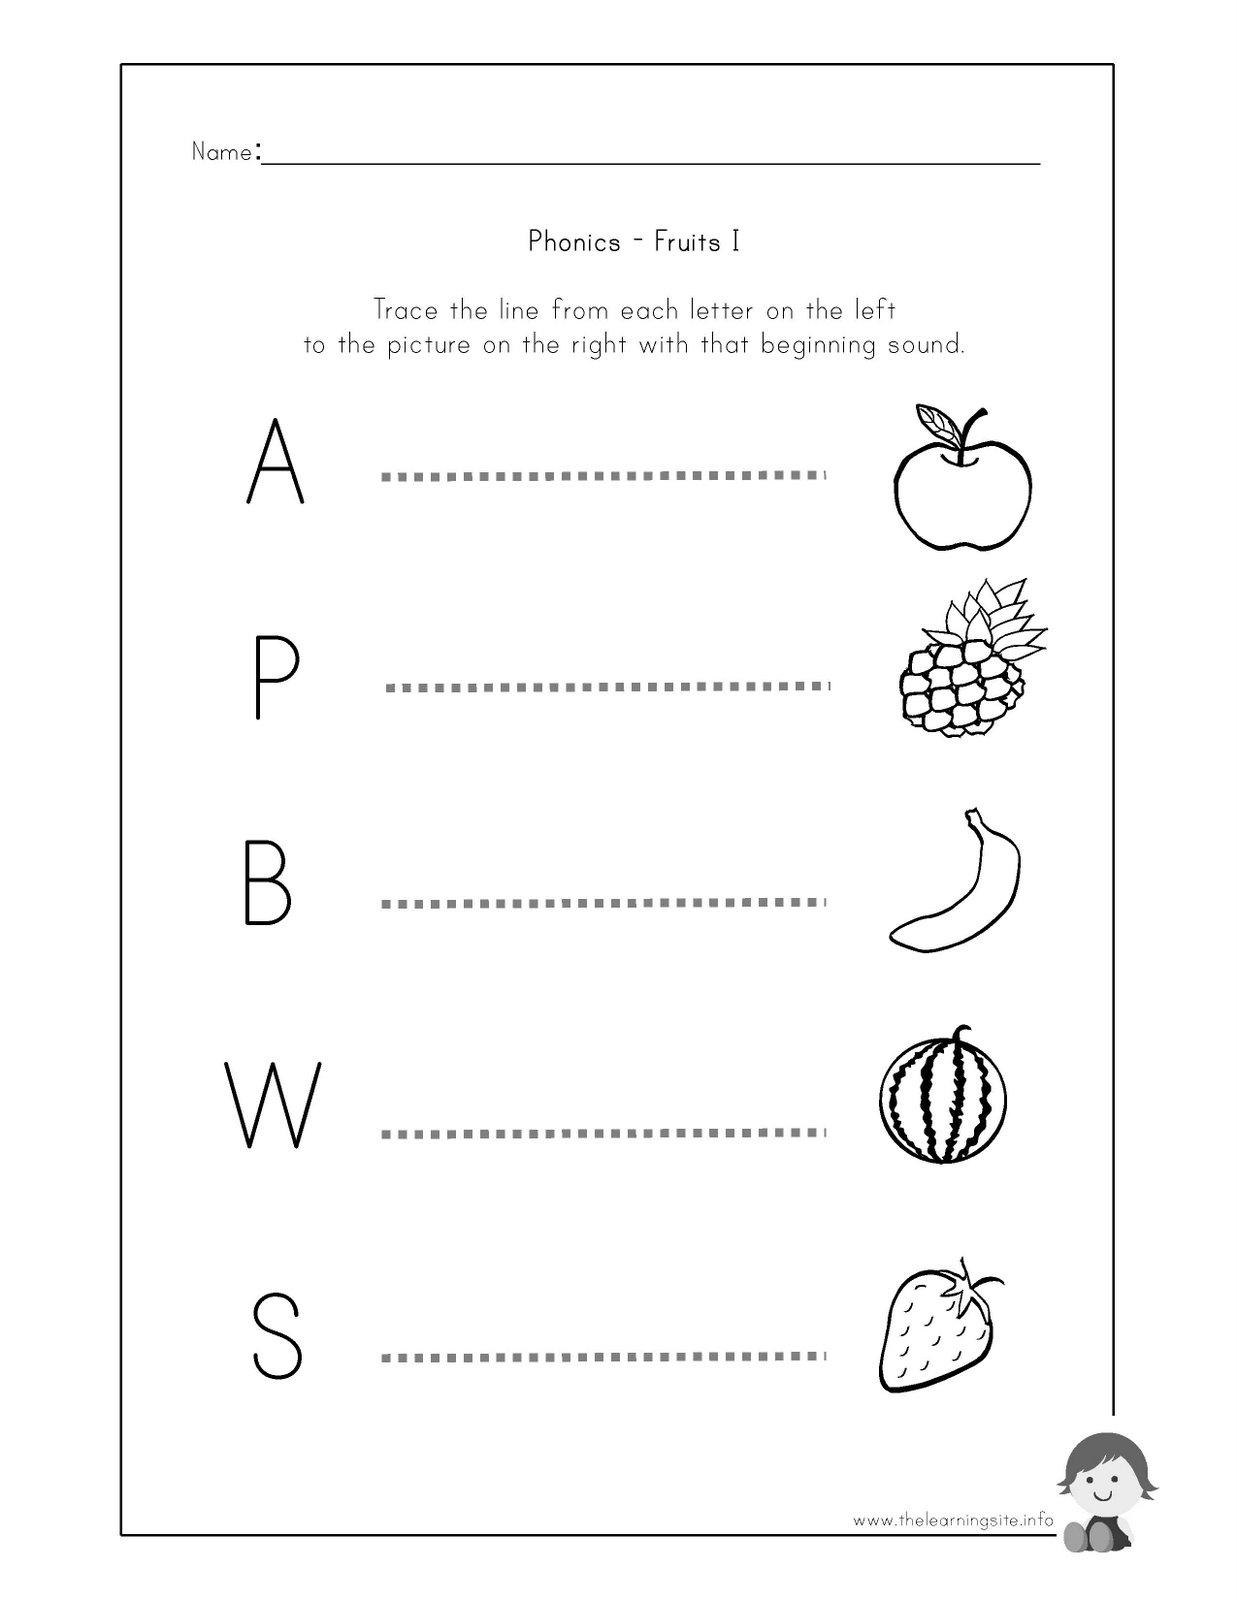 worksheet 1 worksheet 2 worksheet 3 generate your own fruit Images ...